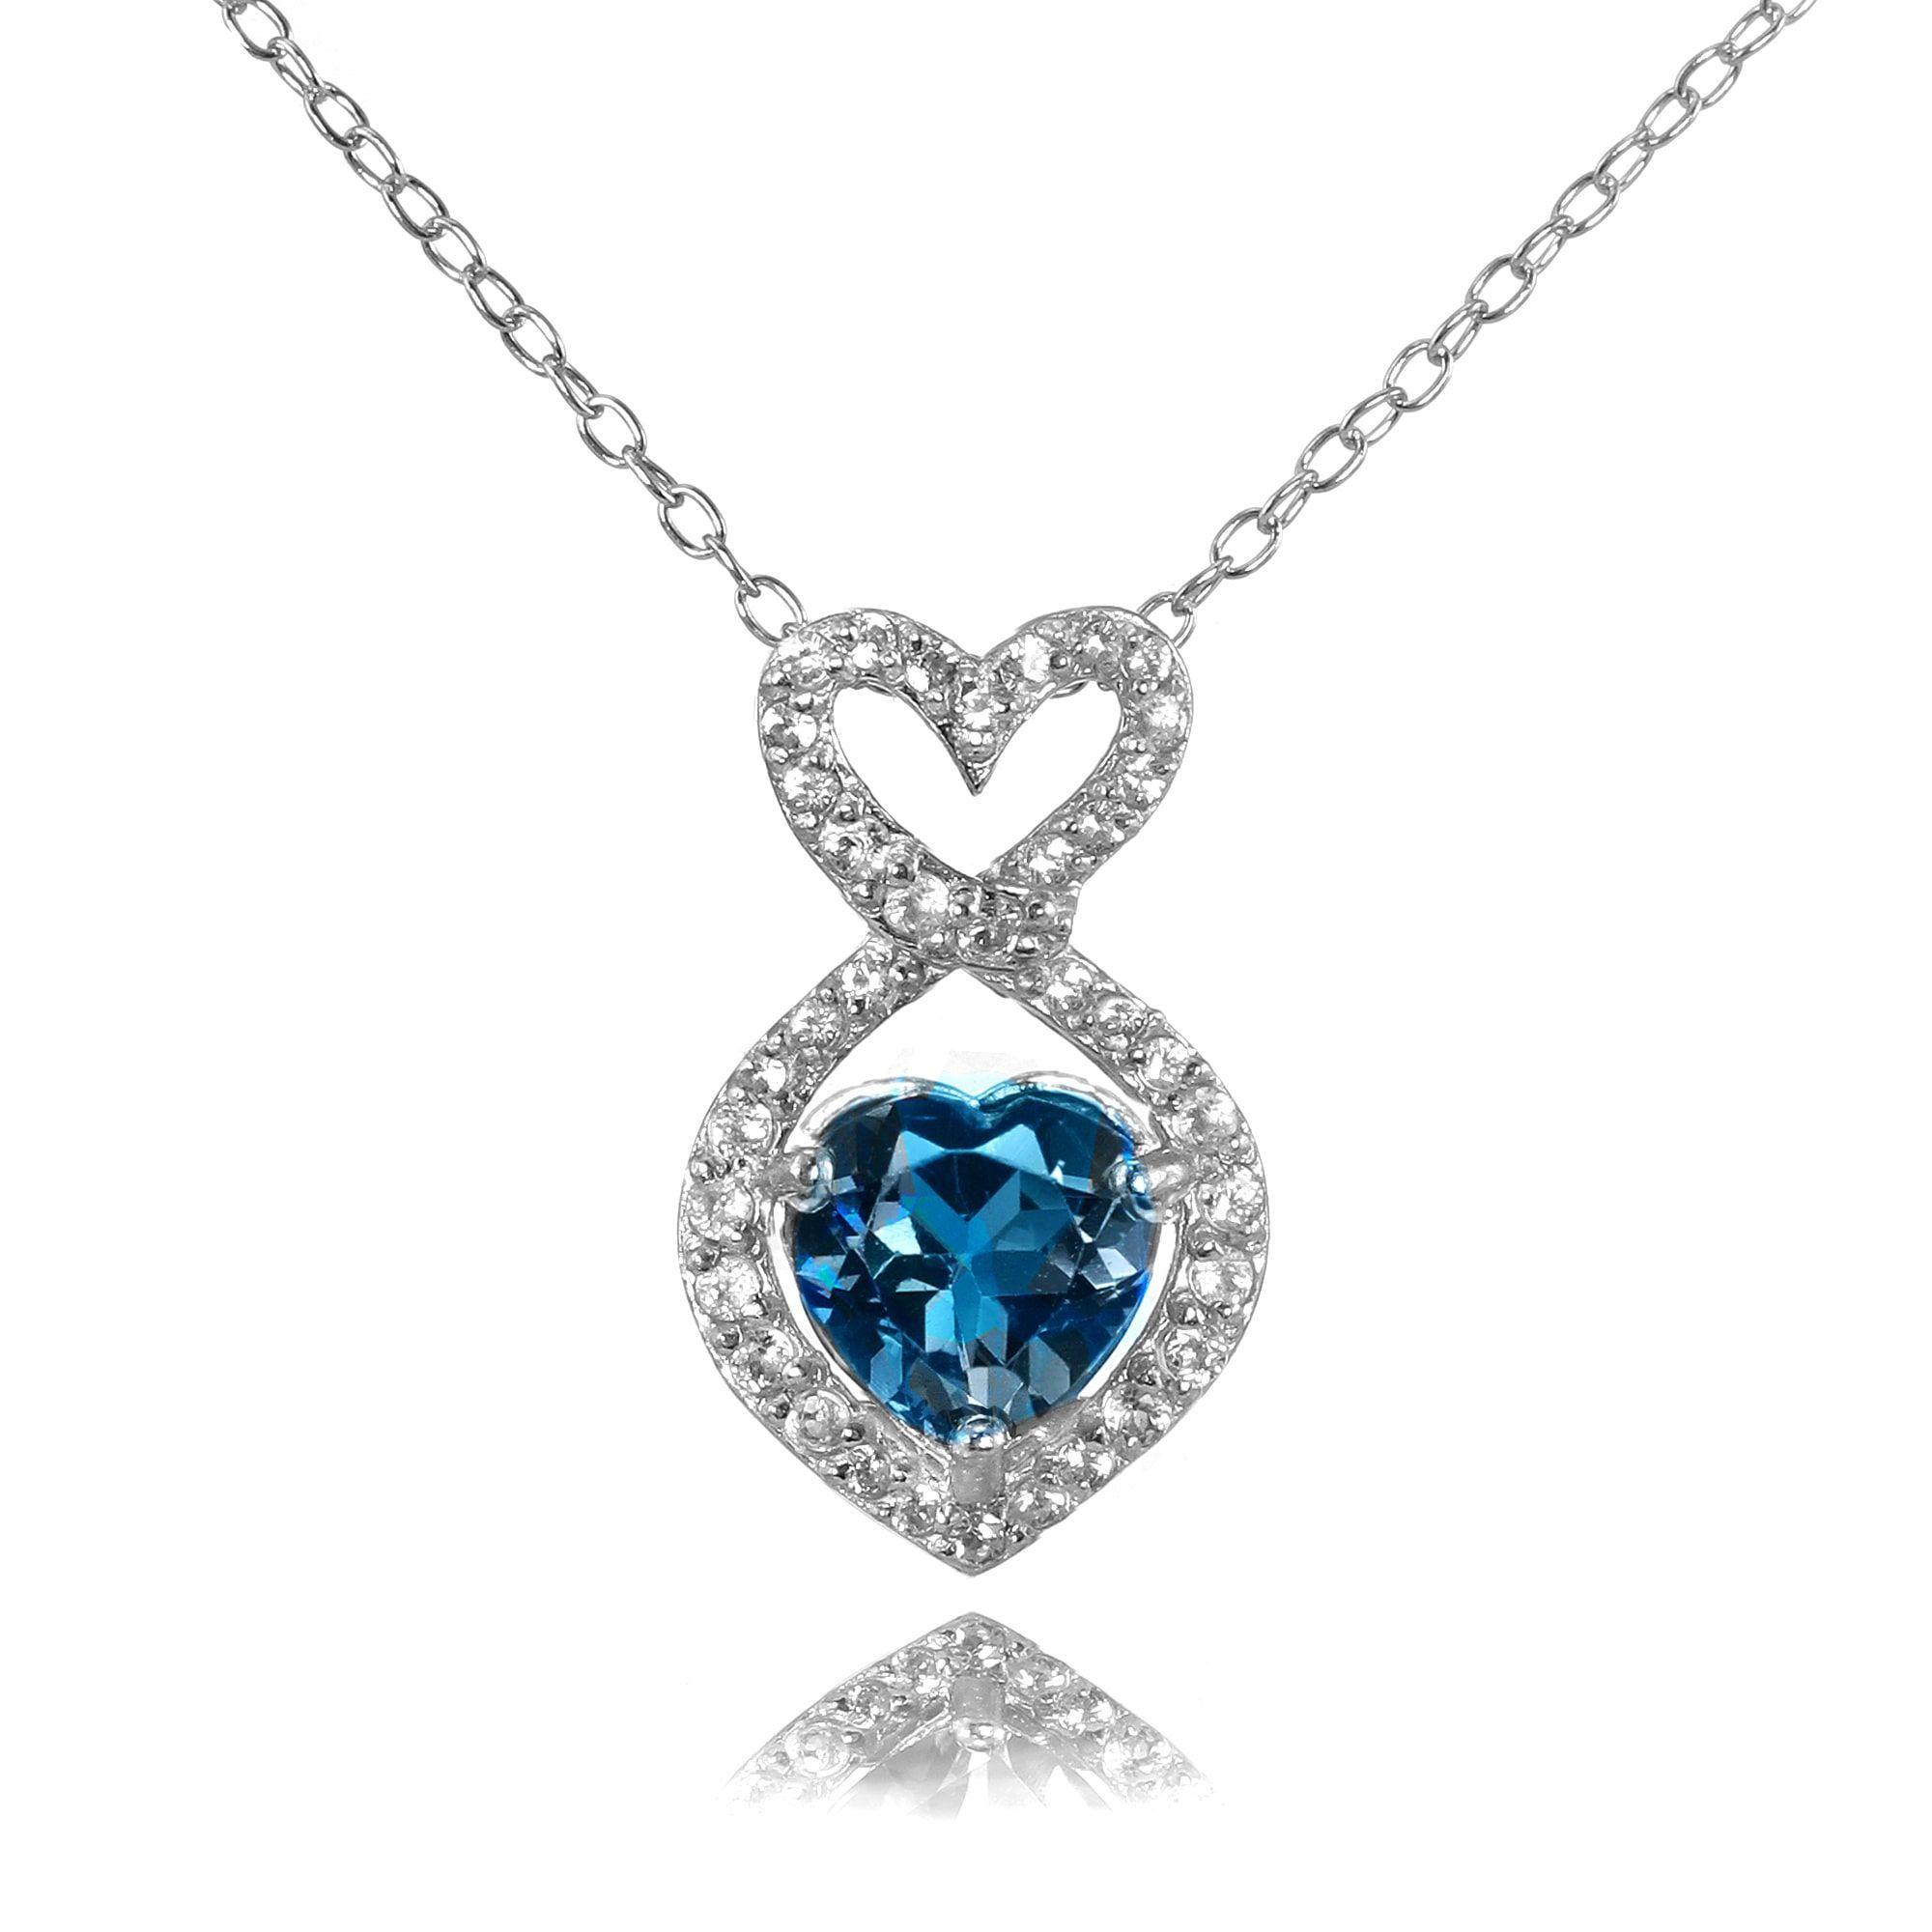 6mm London Blue Topaz London Blue Topaz Infinity Heart Pendant with Diamonds